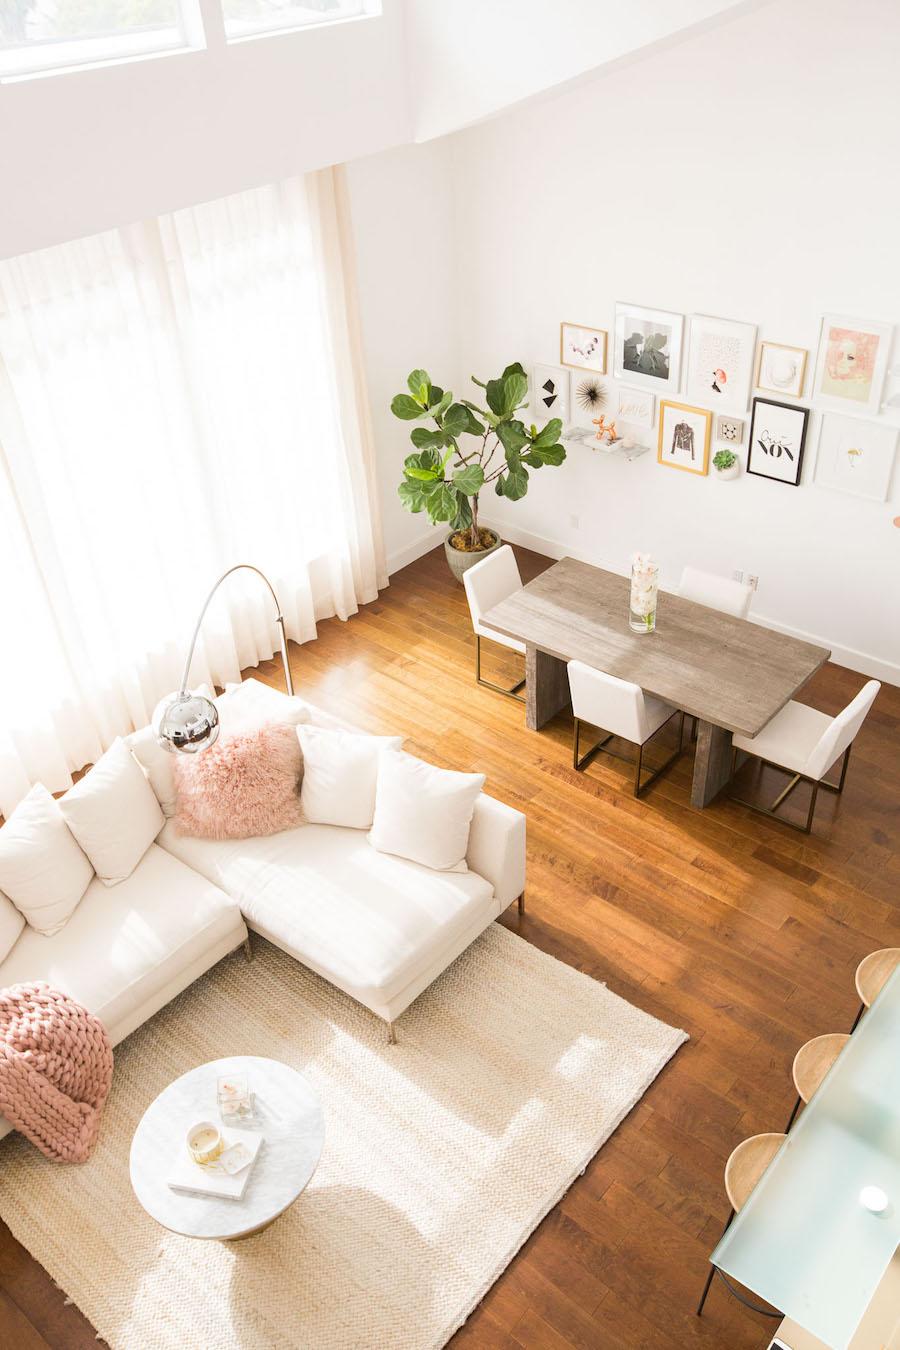 Overhead view of Marianna Hewitt's living room